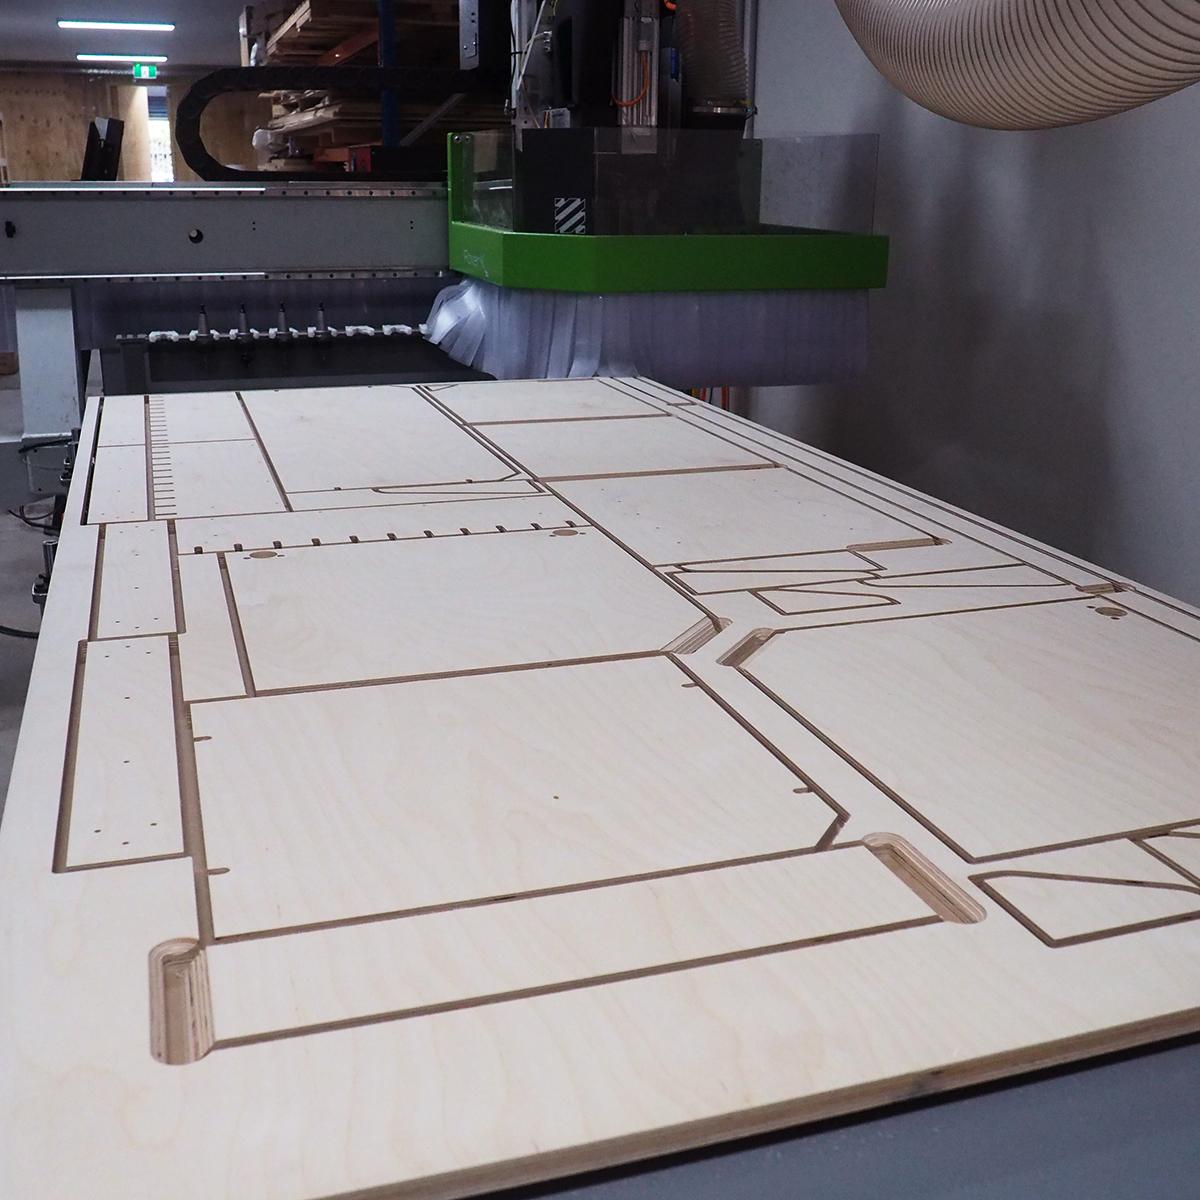 SoWatt-WIP-CNC-Plywood-Clothes-Rack-02.JPG